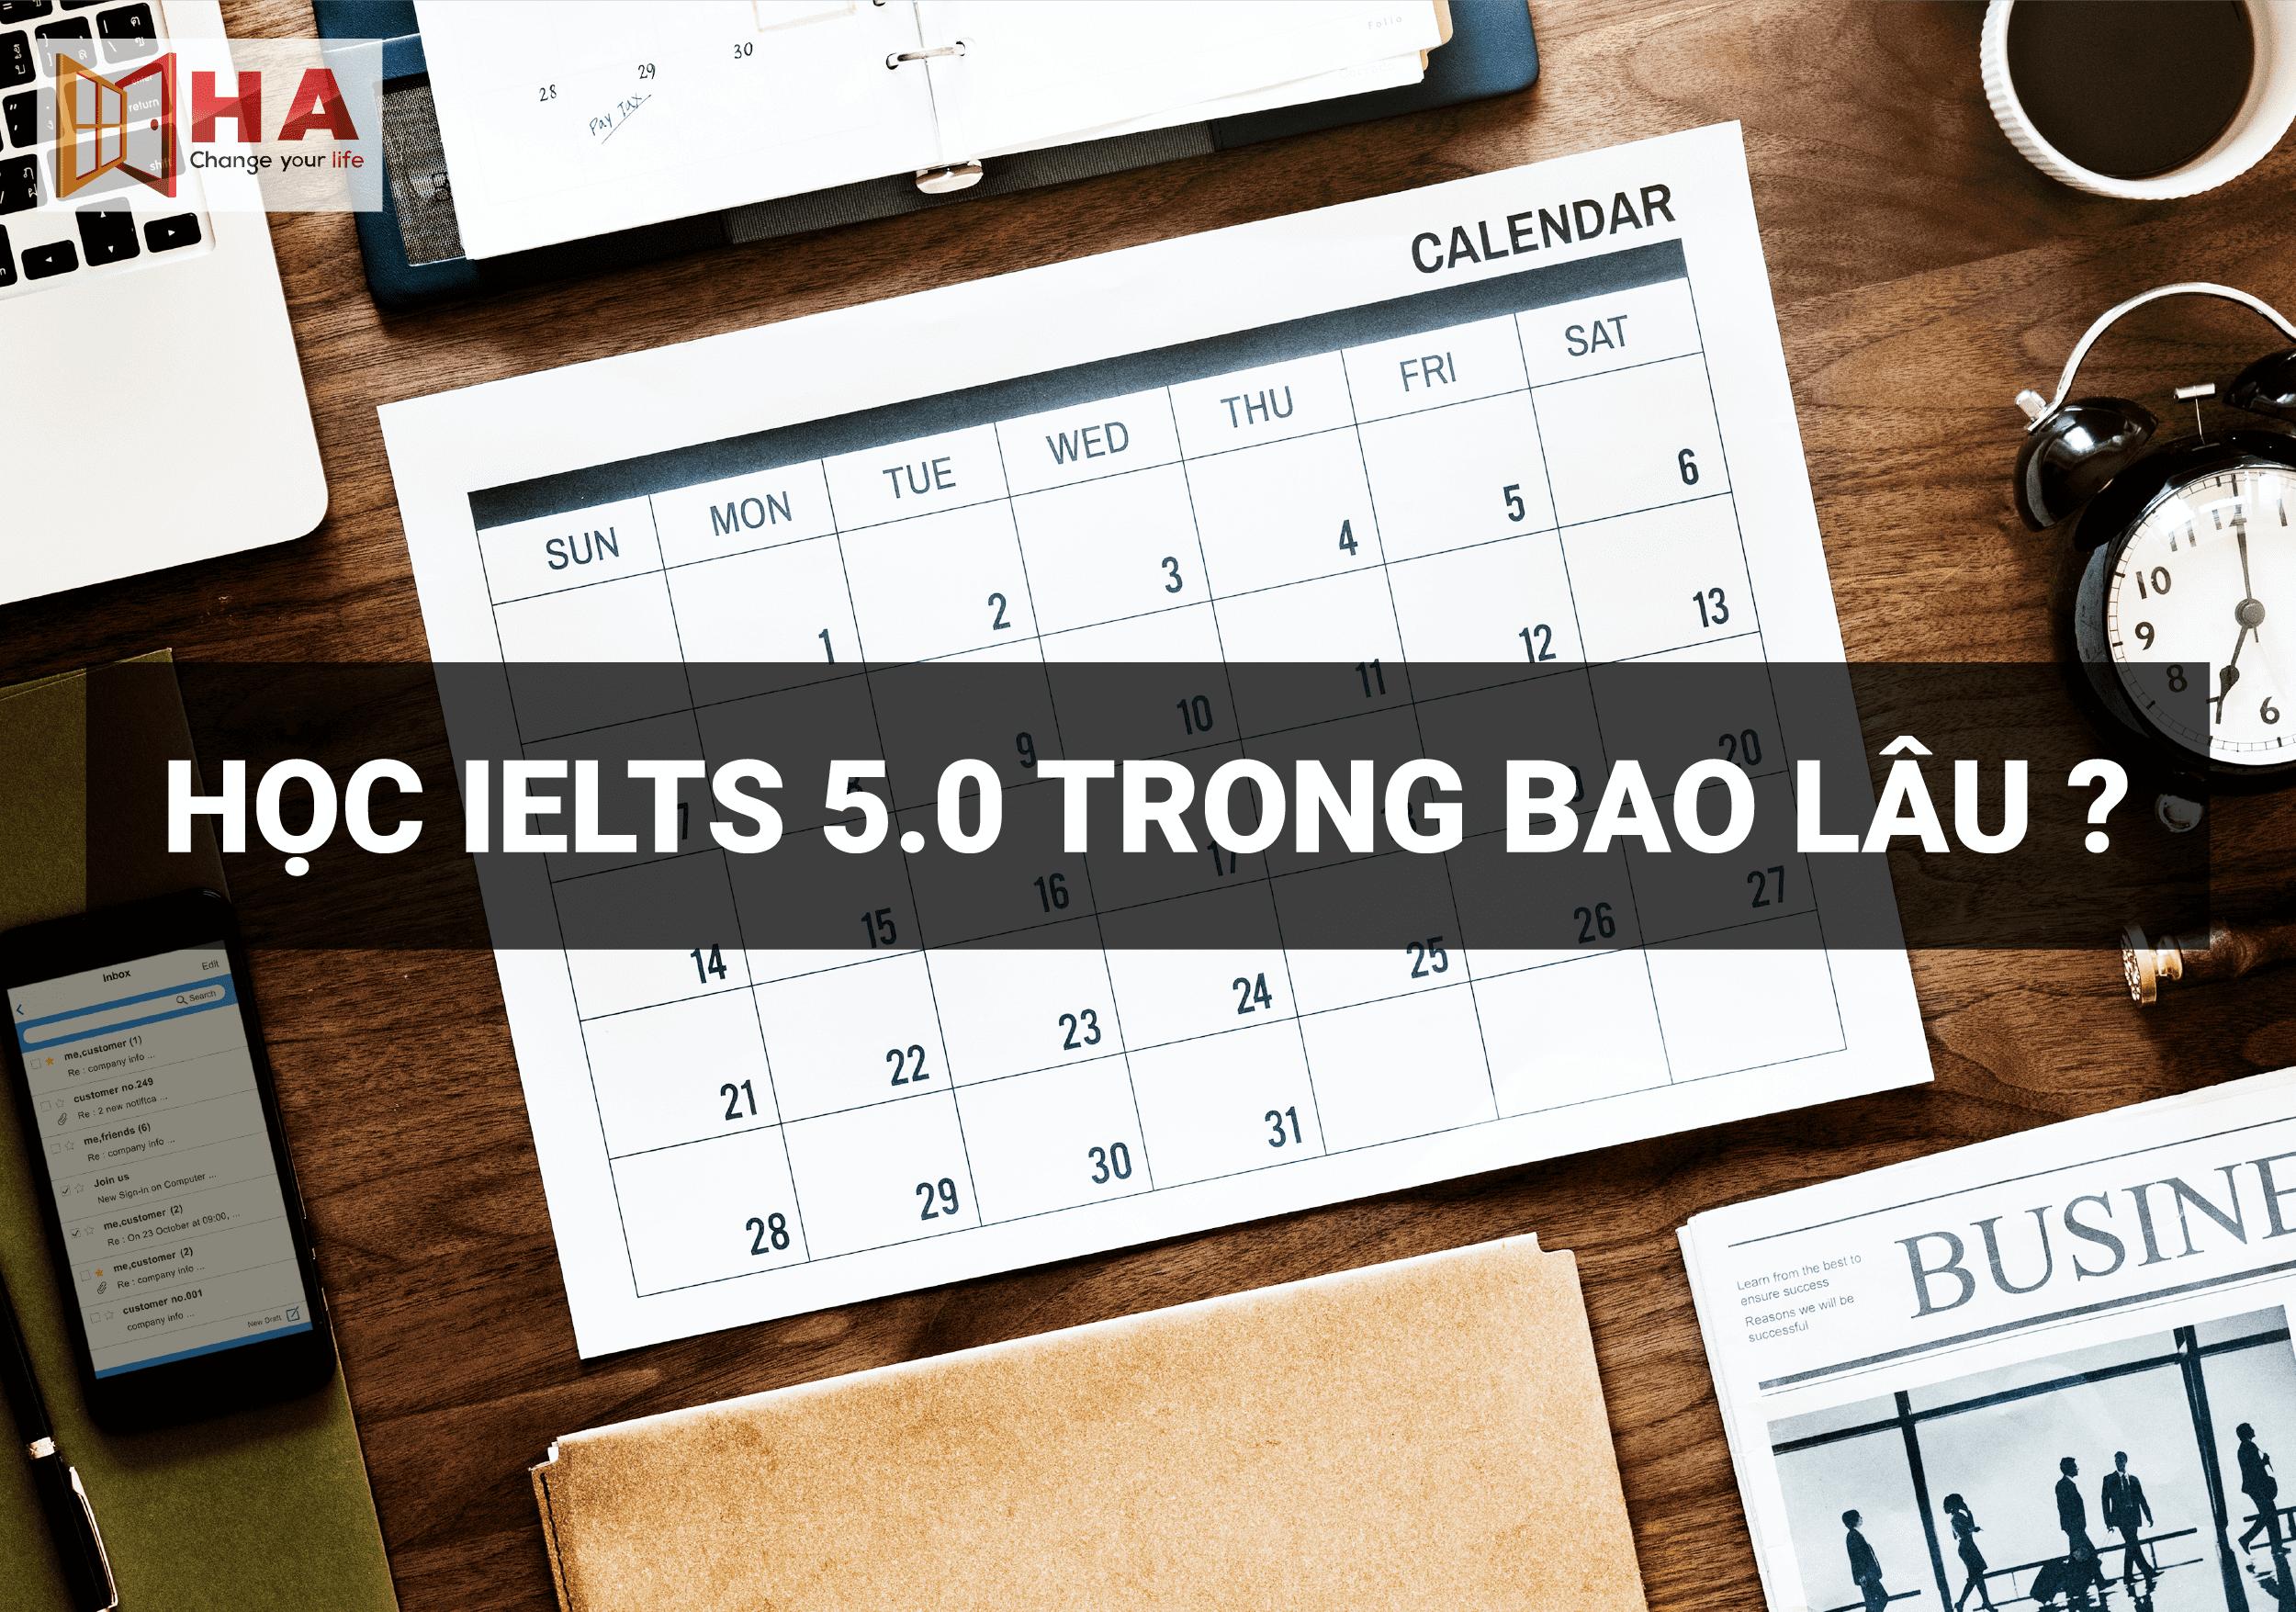 Học IELTS 5.0 mất bao lâu